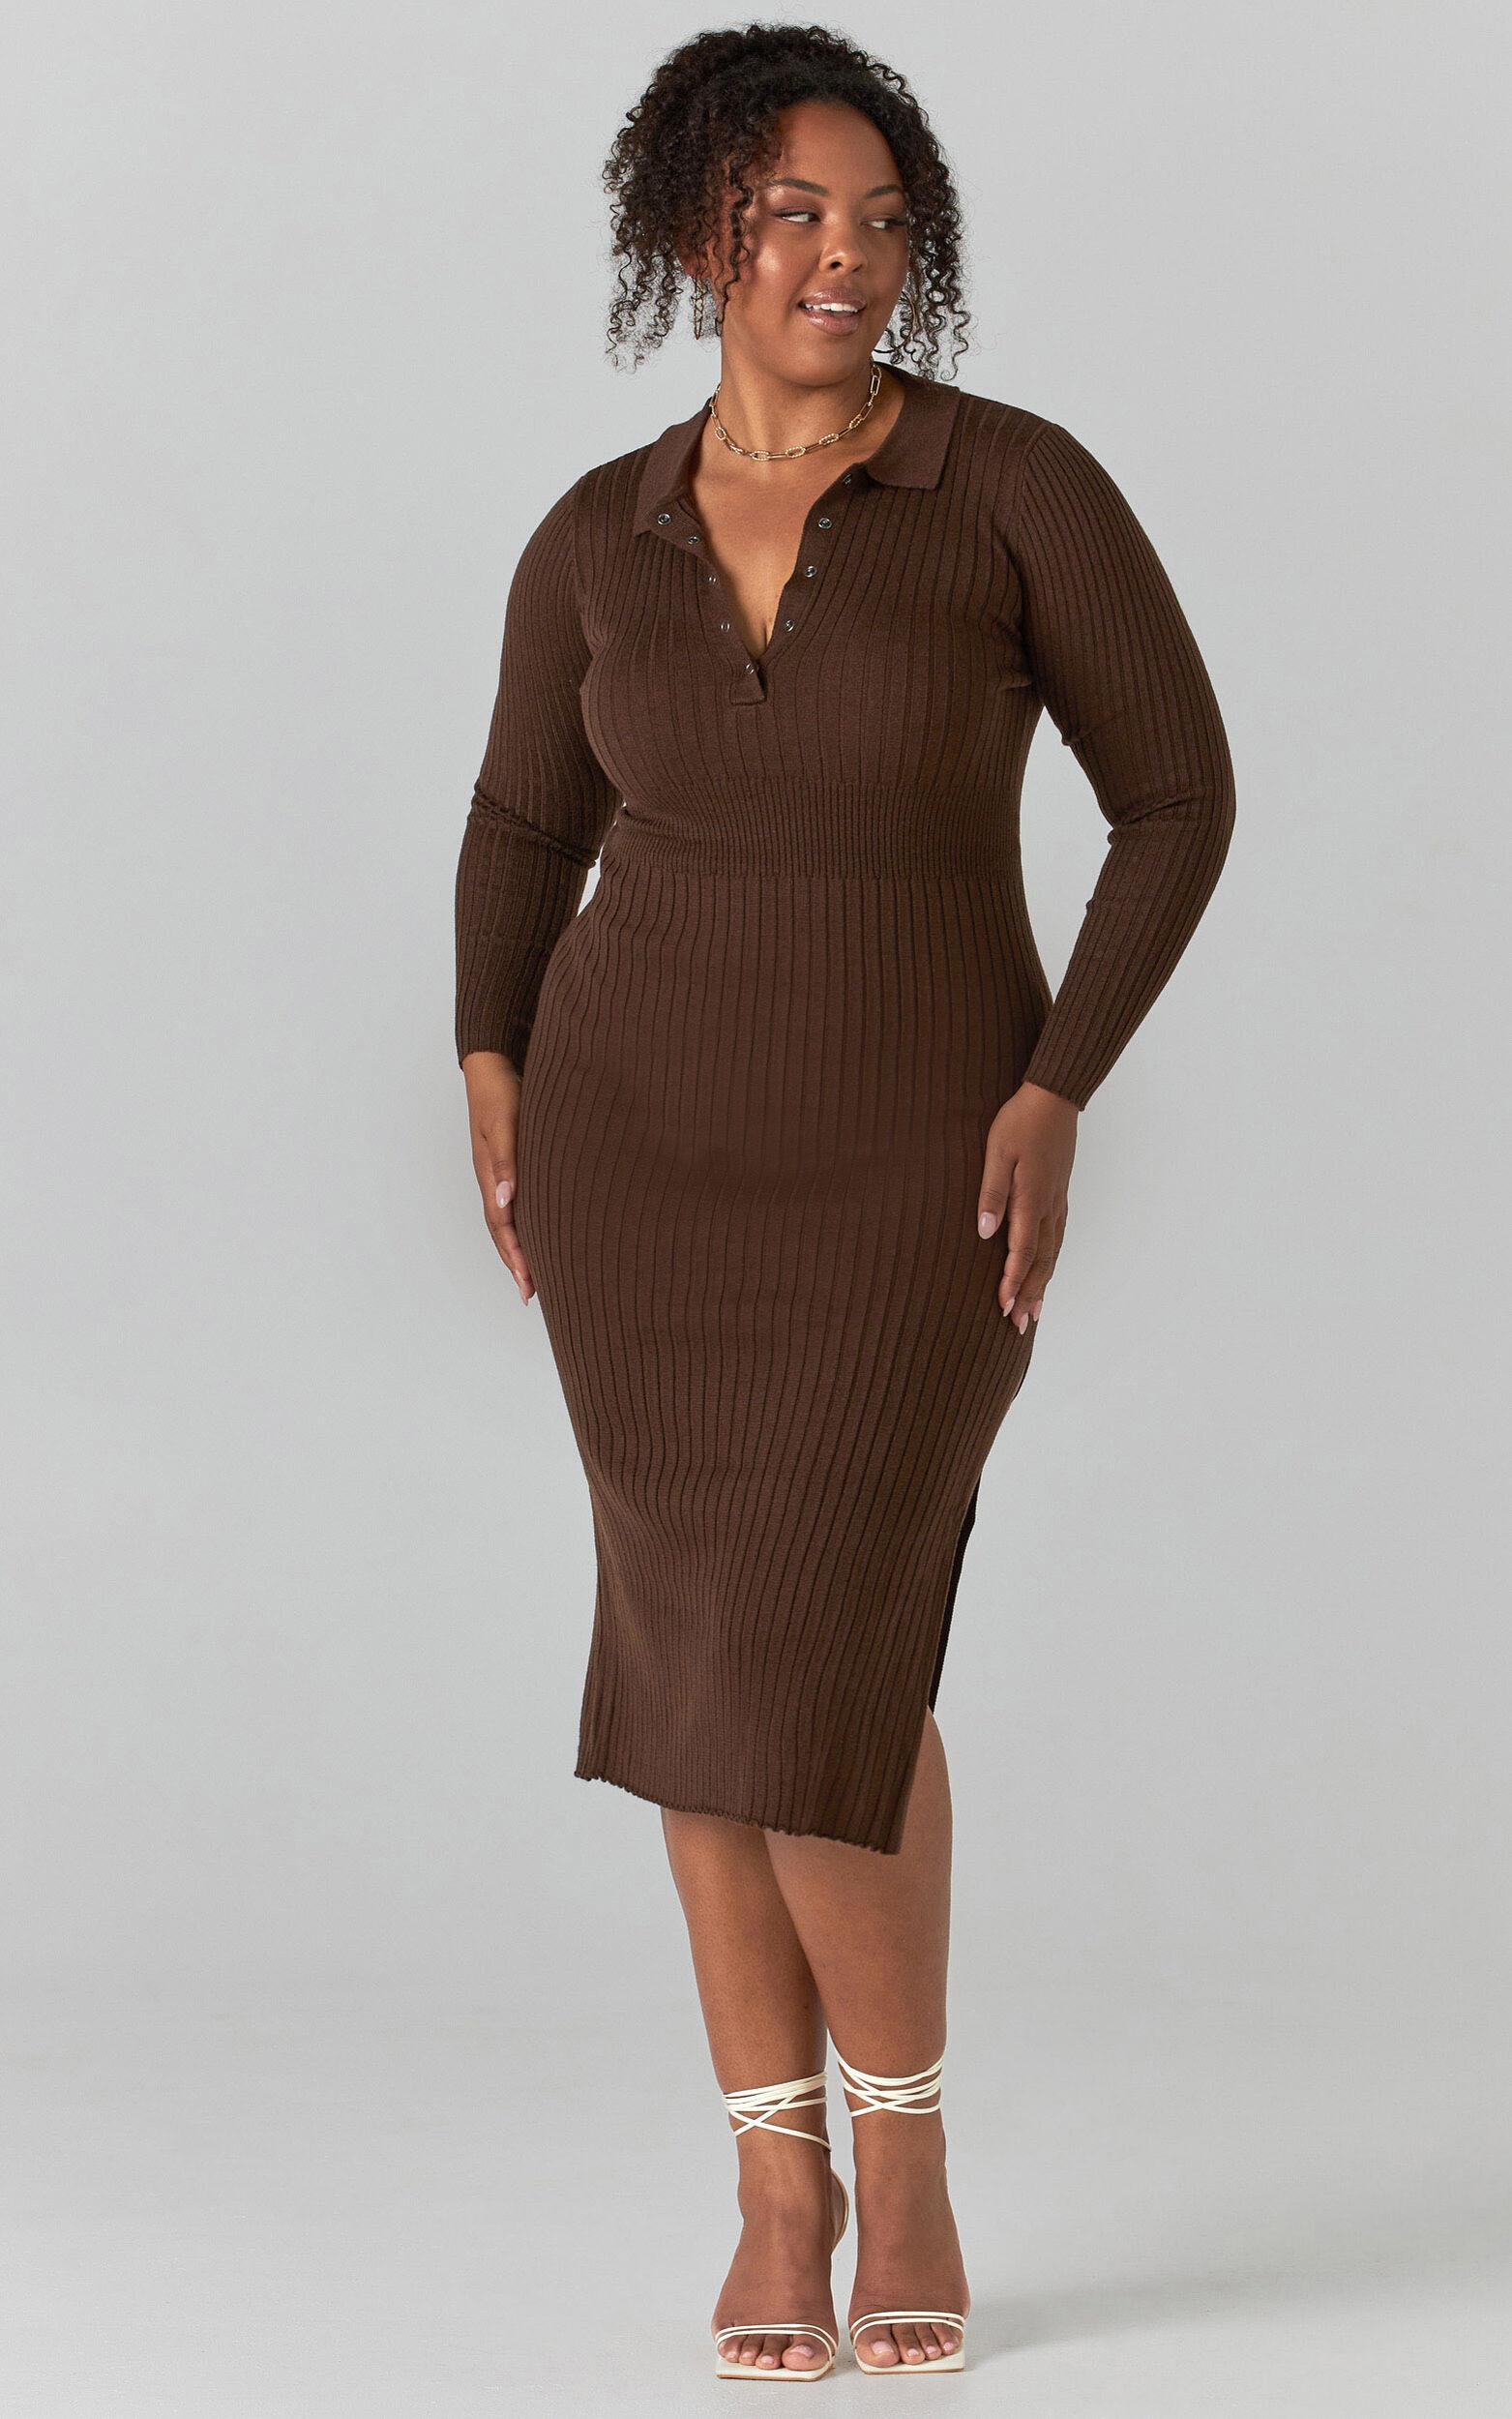 Ellidy Collared Midi Knit Dress in Dark Chocolate Brown - 20, BRN1, super-hi-res image number null